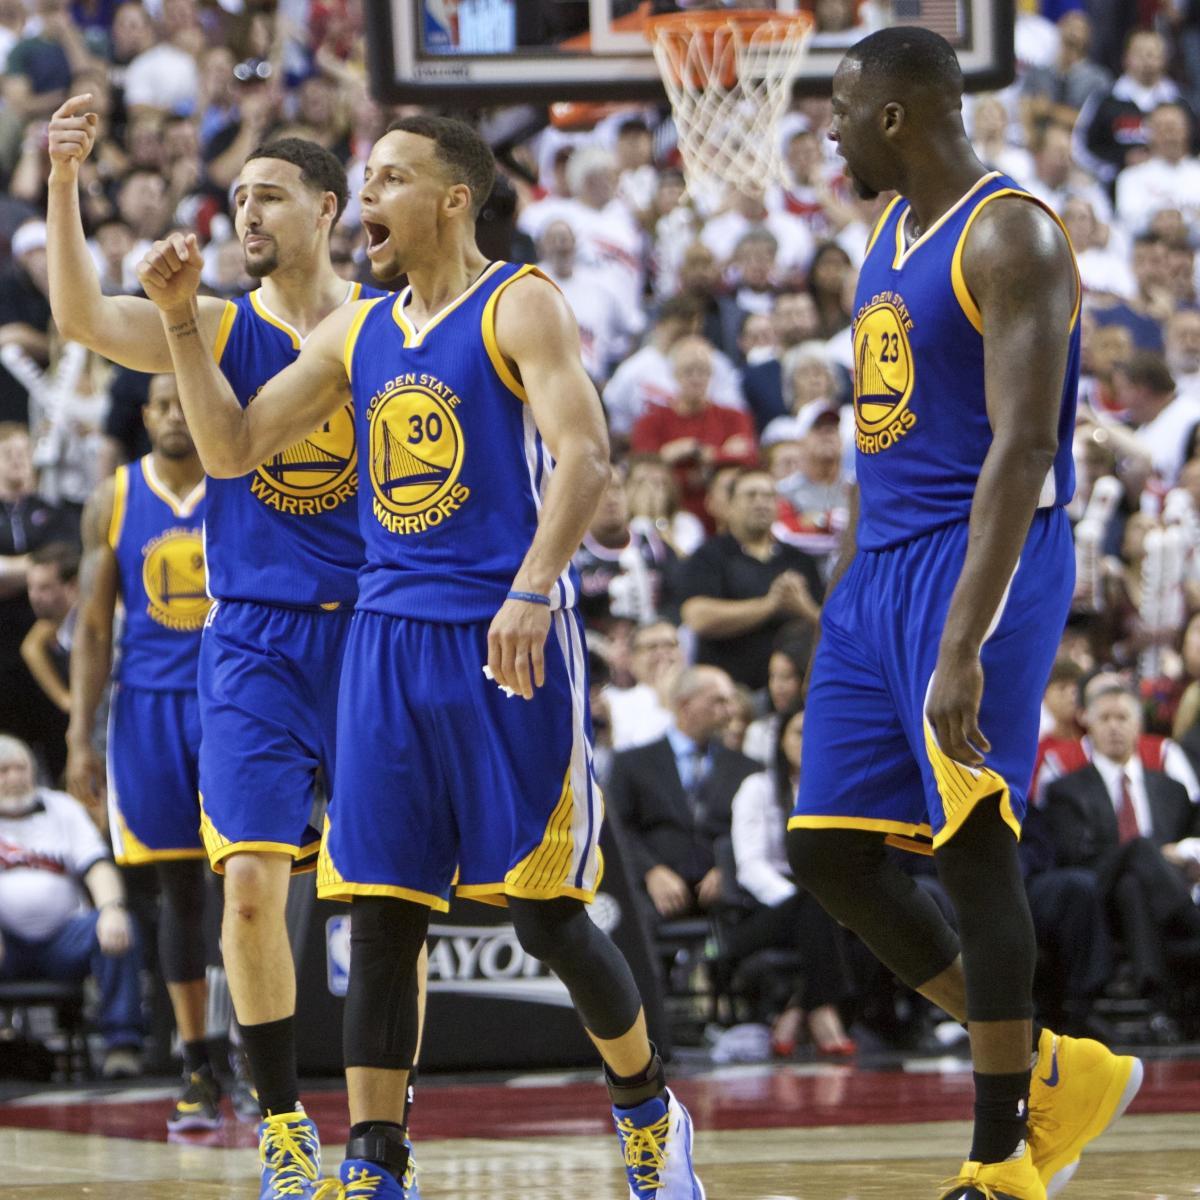 Portland Blazers Game Score: Warriors Vs Trail Blazers: Game 4 Score, Twitter Reaction